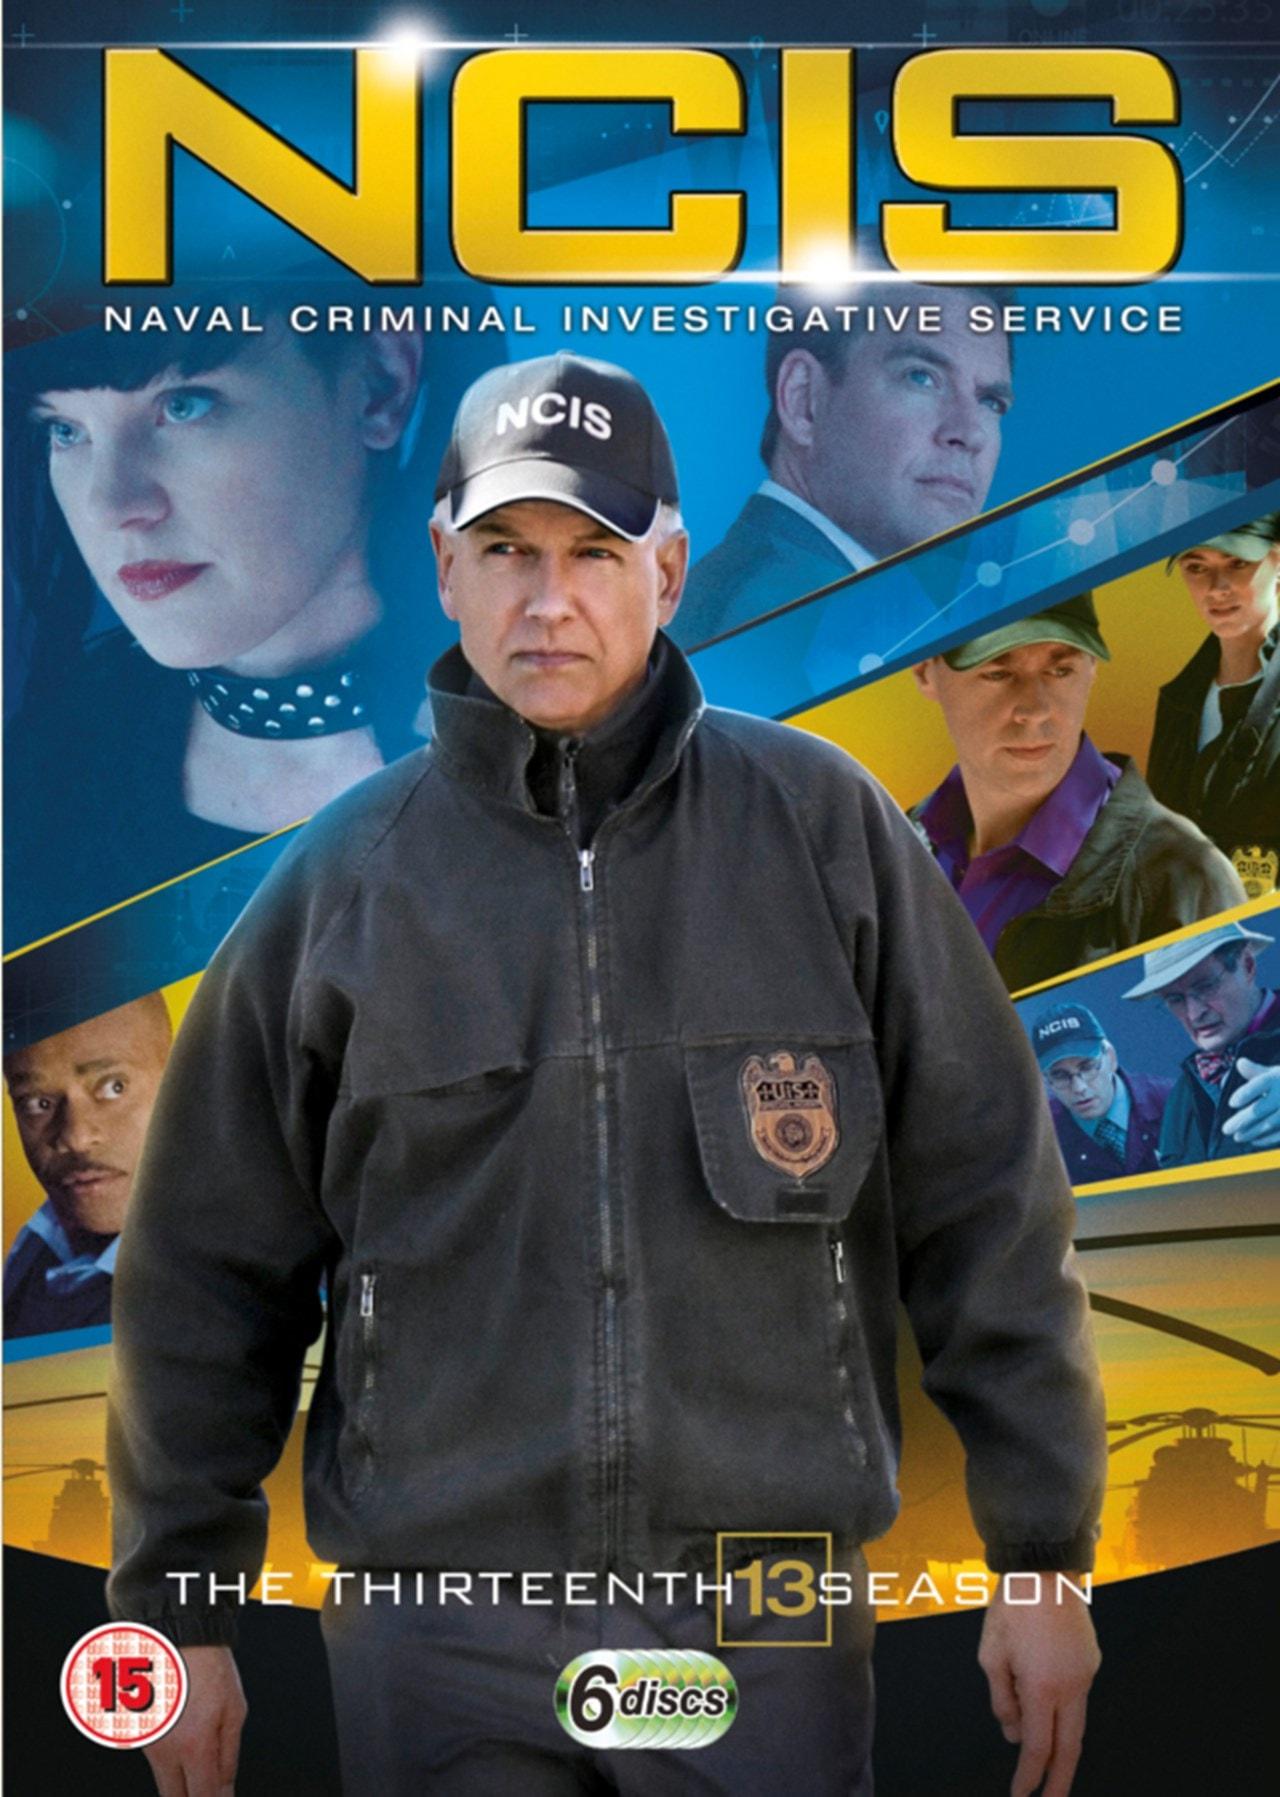 NCIS: The Thirteenth Season - 1